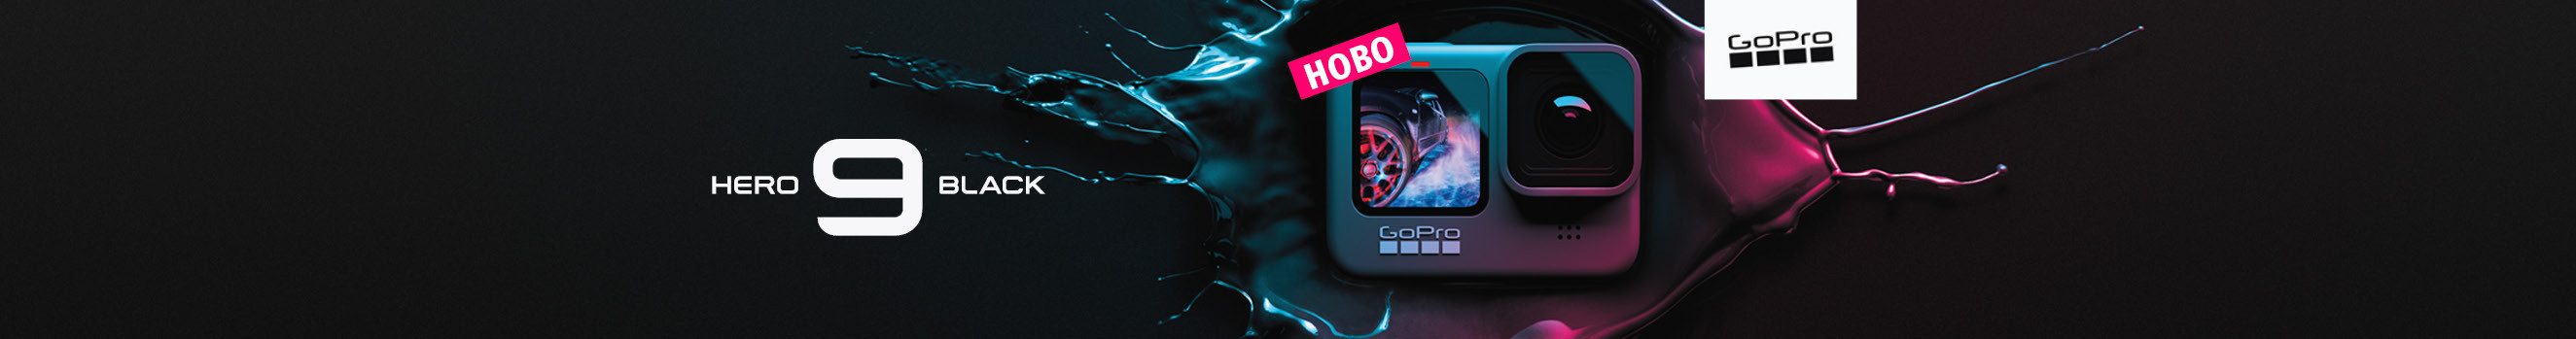 Екшън камера GoPro HERO9 Black